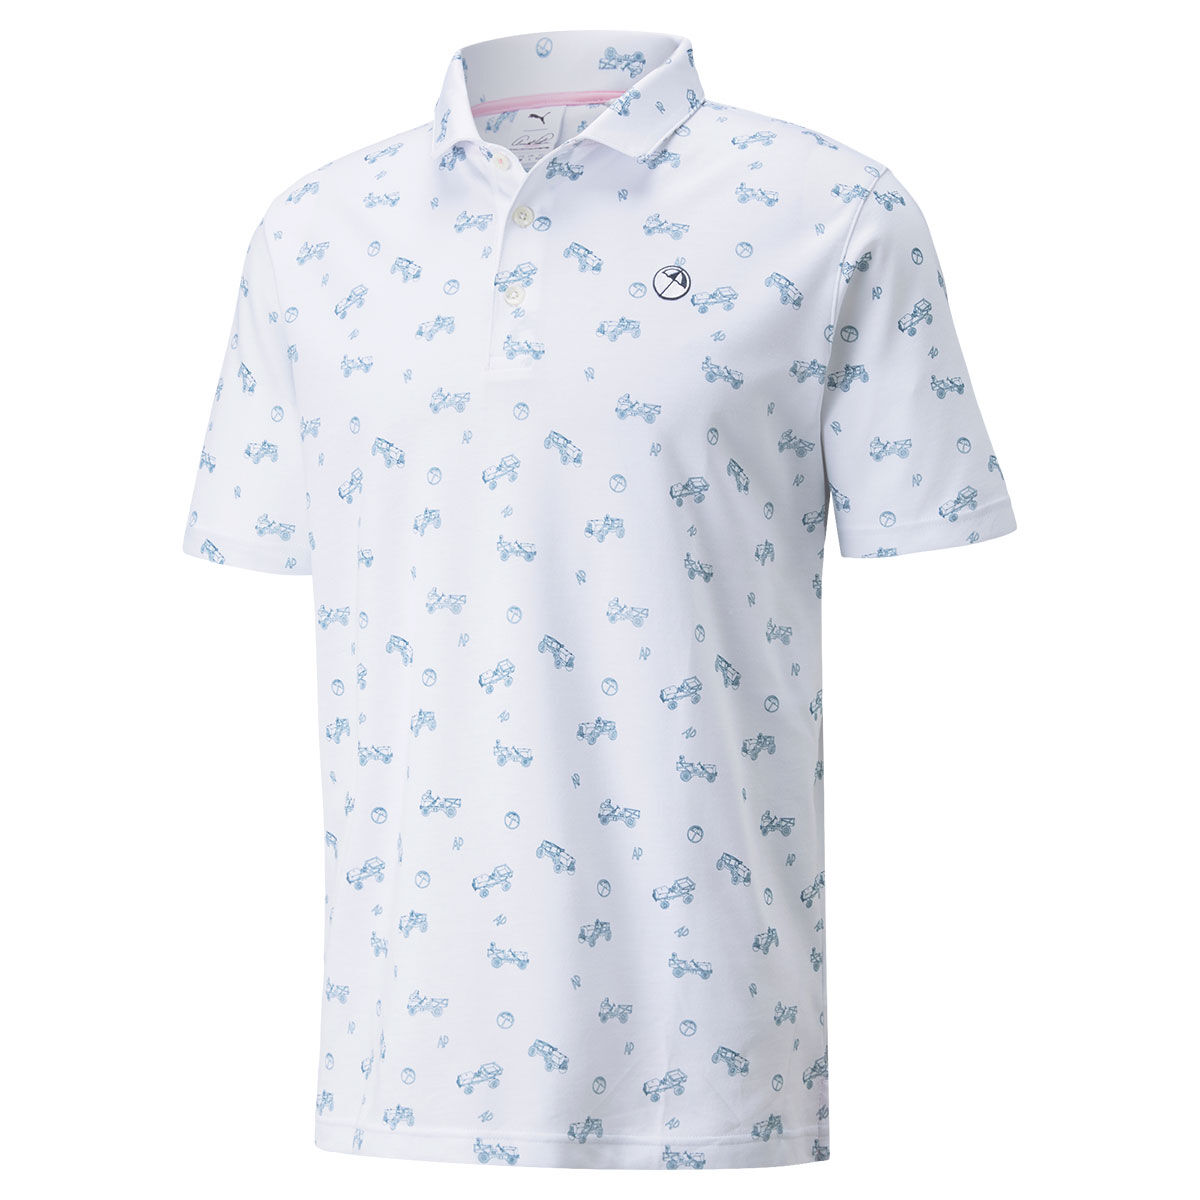 PUMA Golf AP Best Friend Golf Polo Shirt, Mens, Large, Bright white | American Golf